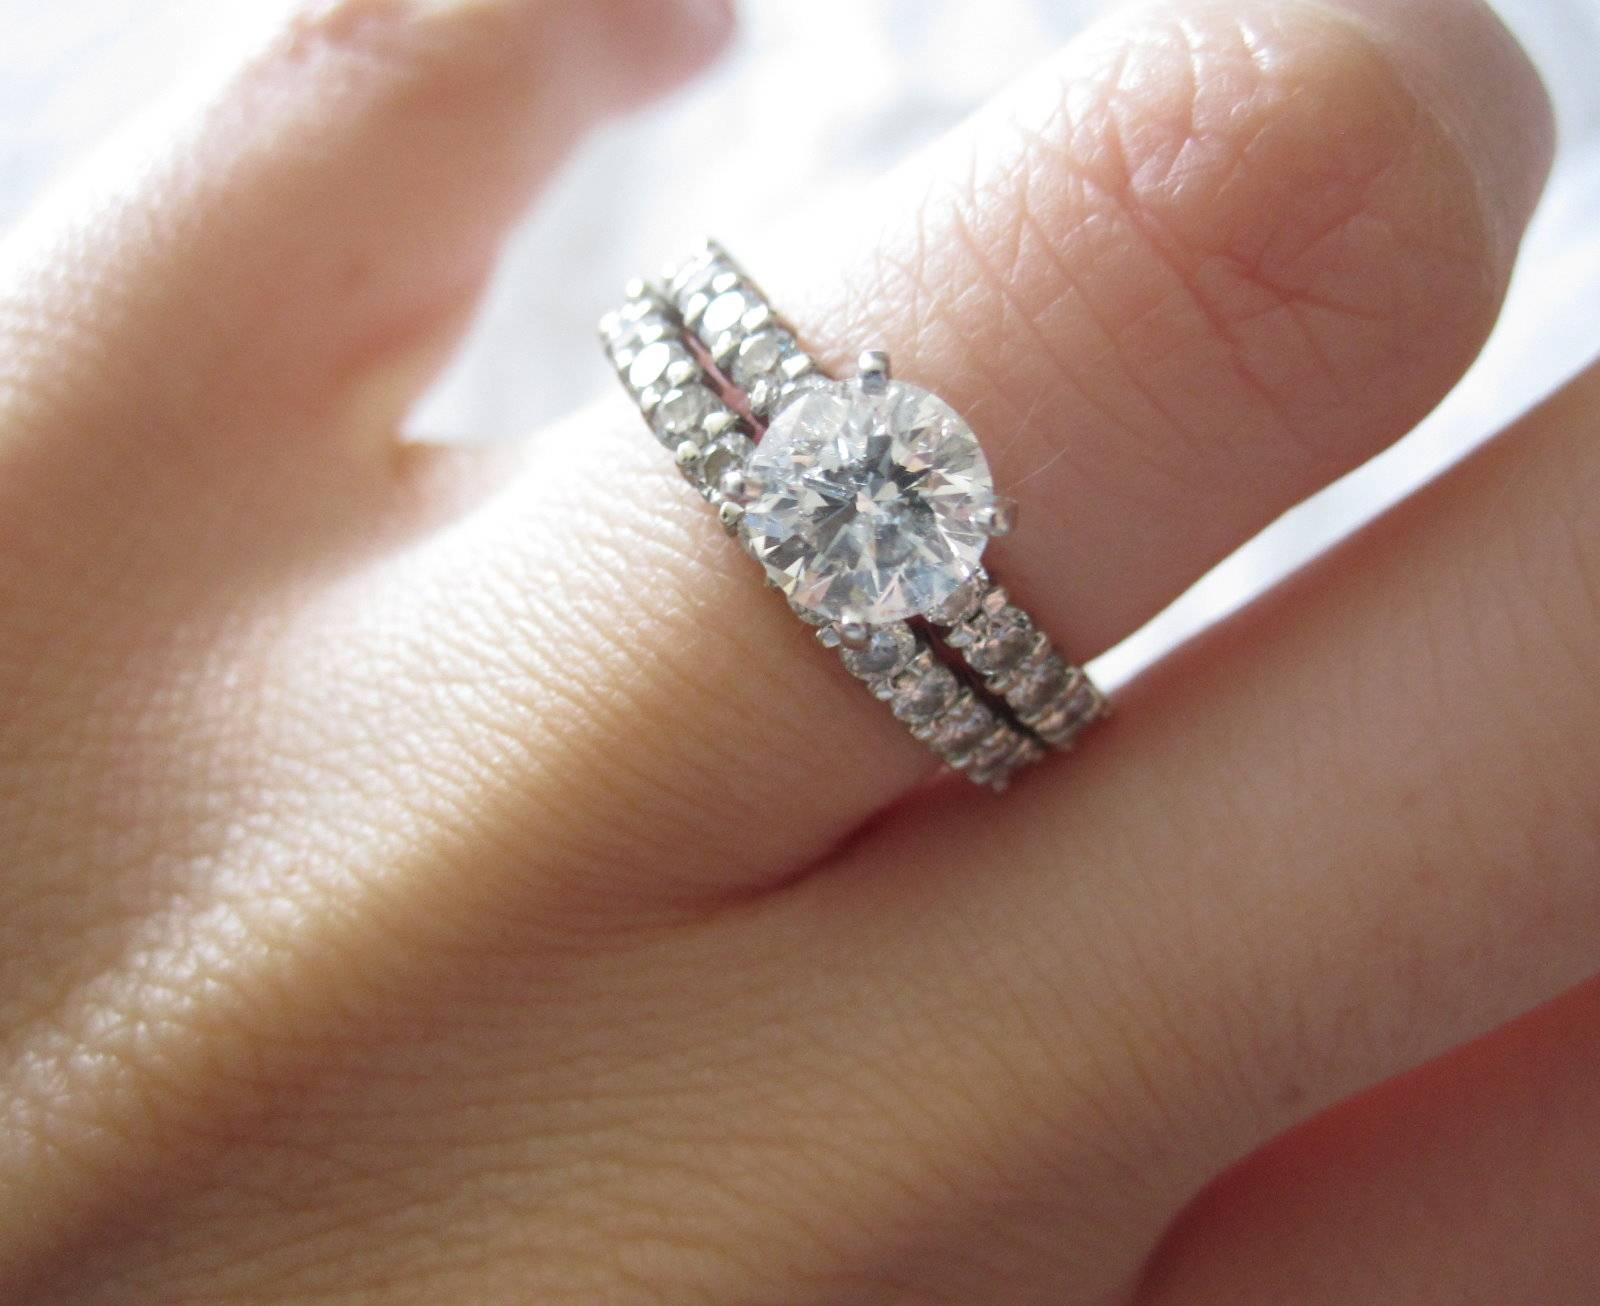 Wedding Band Engagement Ring Pertaining To Wedding Bands And Engagement Rings (View 10 of 15)